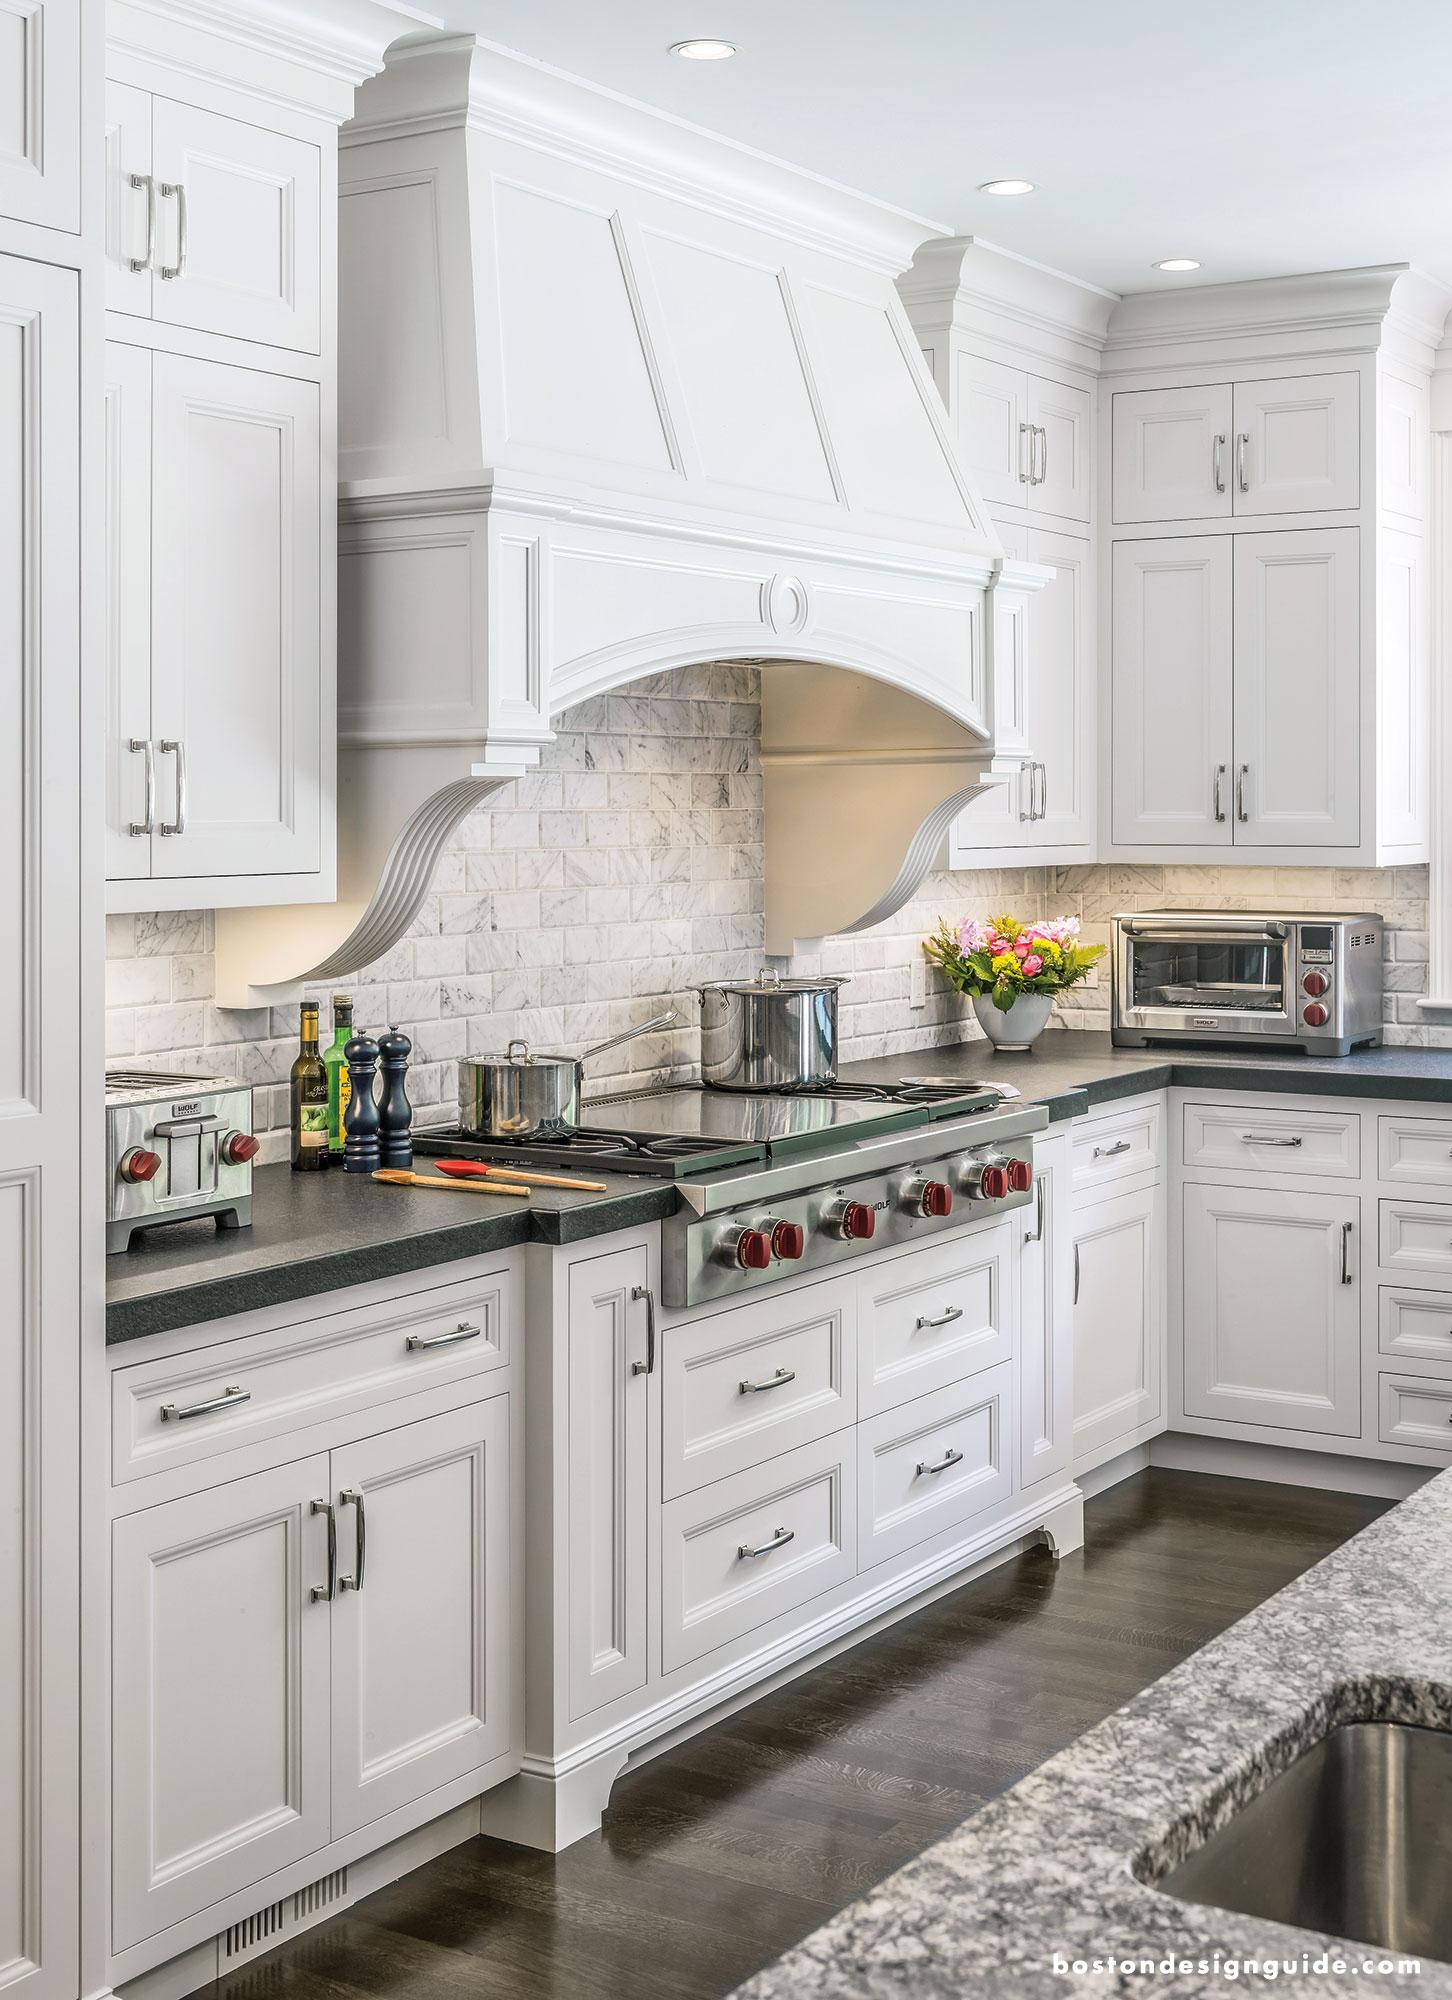 architectural kitchens  view gallery architectural kitchens  rh   bostondesignguide com